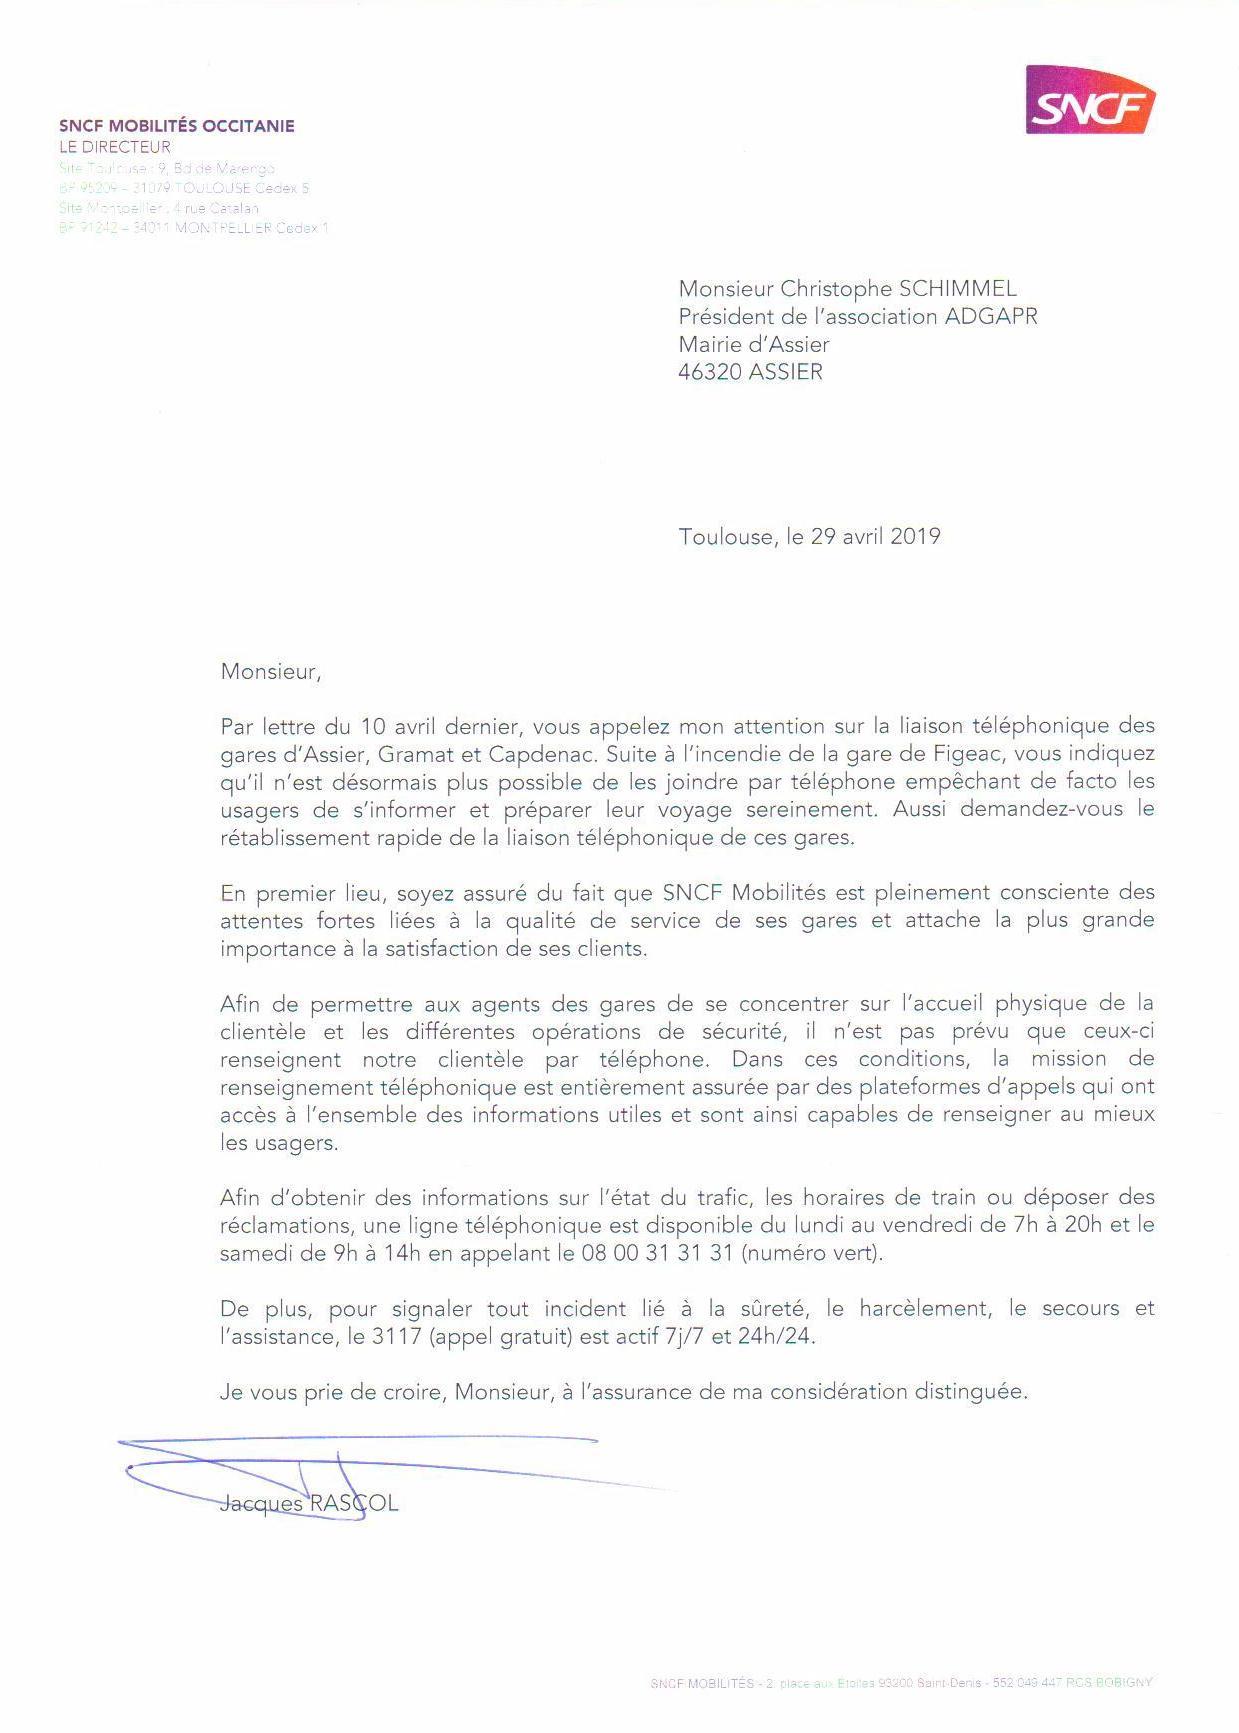 2019-04-29 Réponse Rascol Rétablissement téléphone.jpg